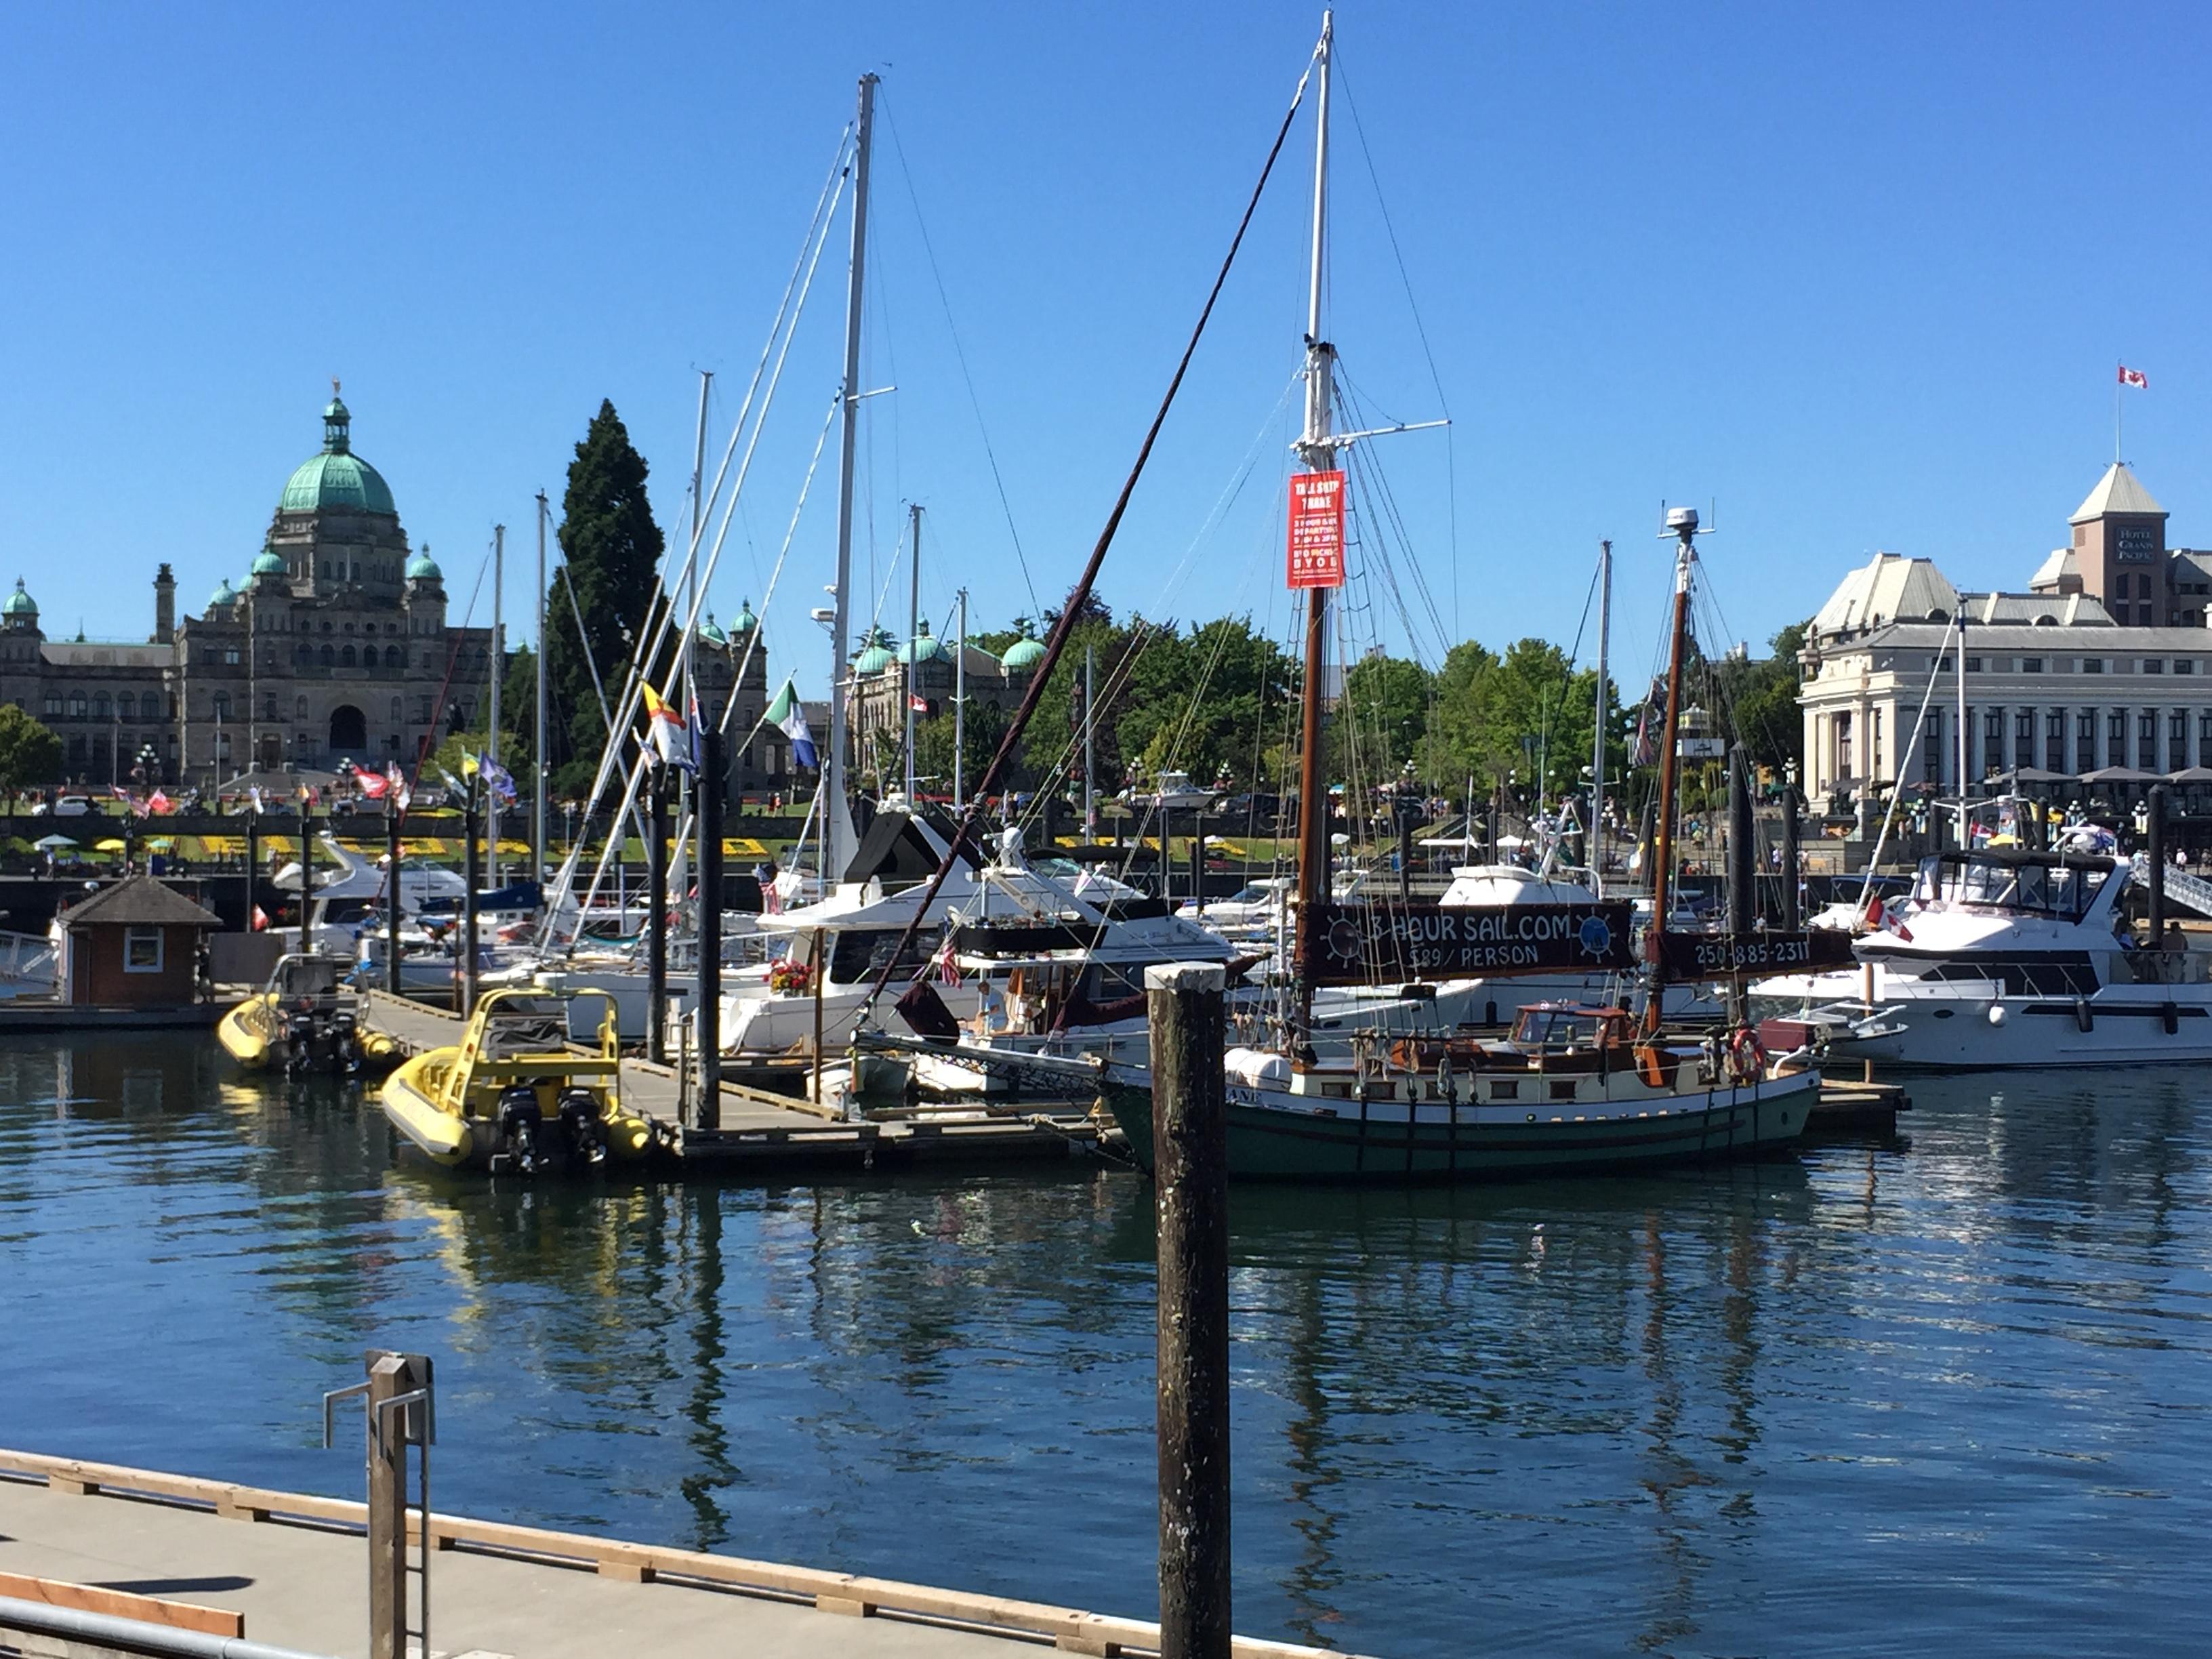 A Day in Victoria, B.C.